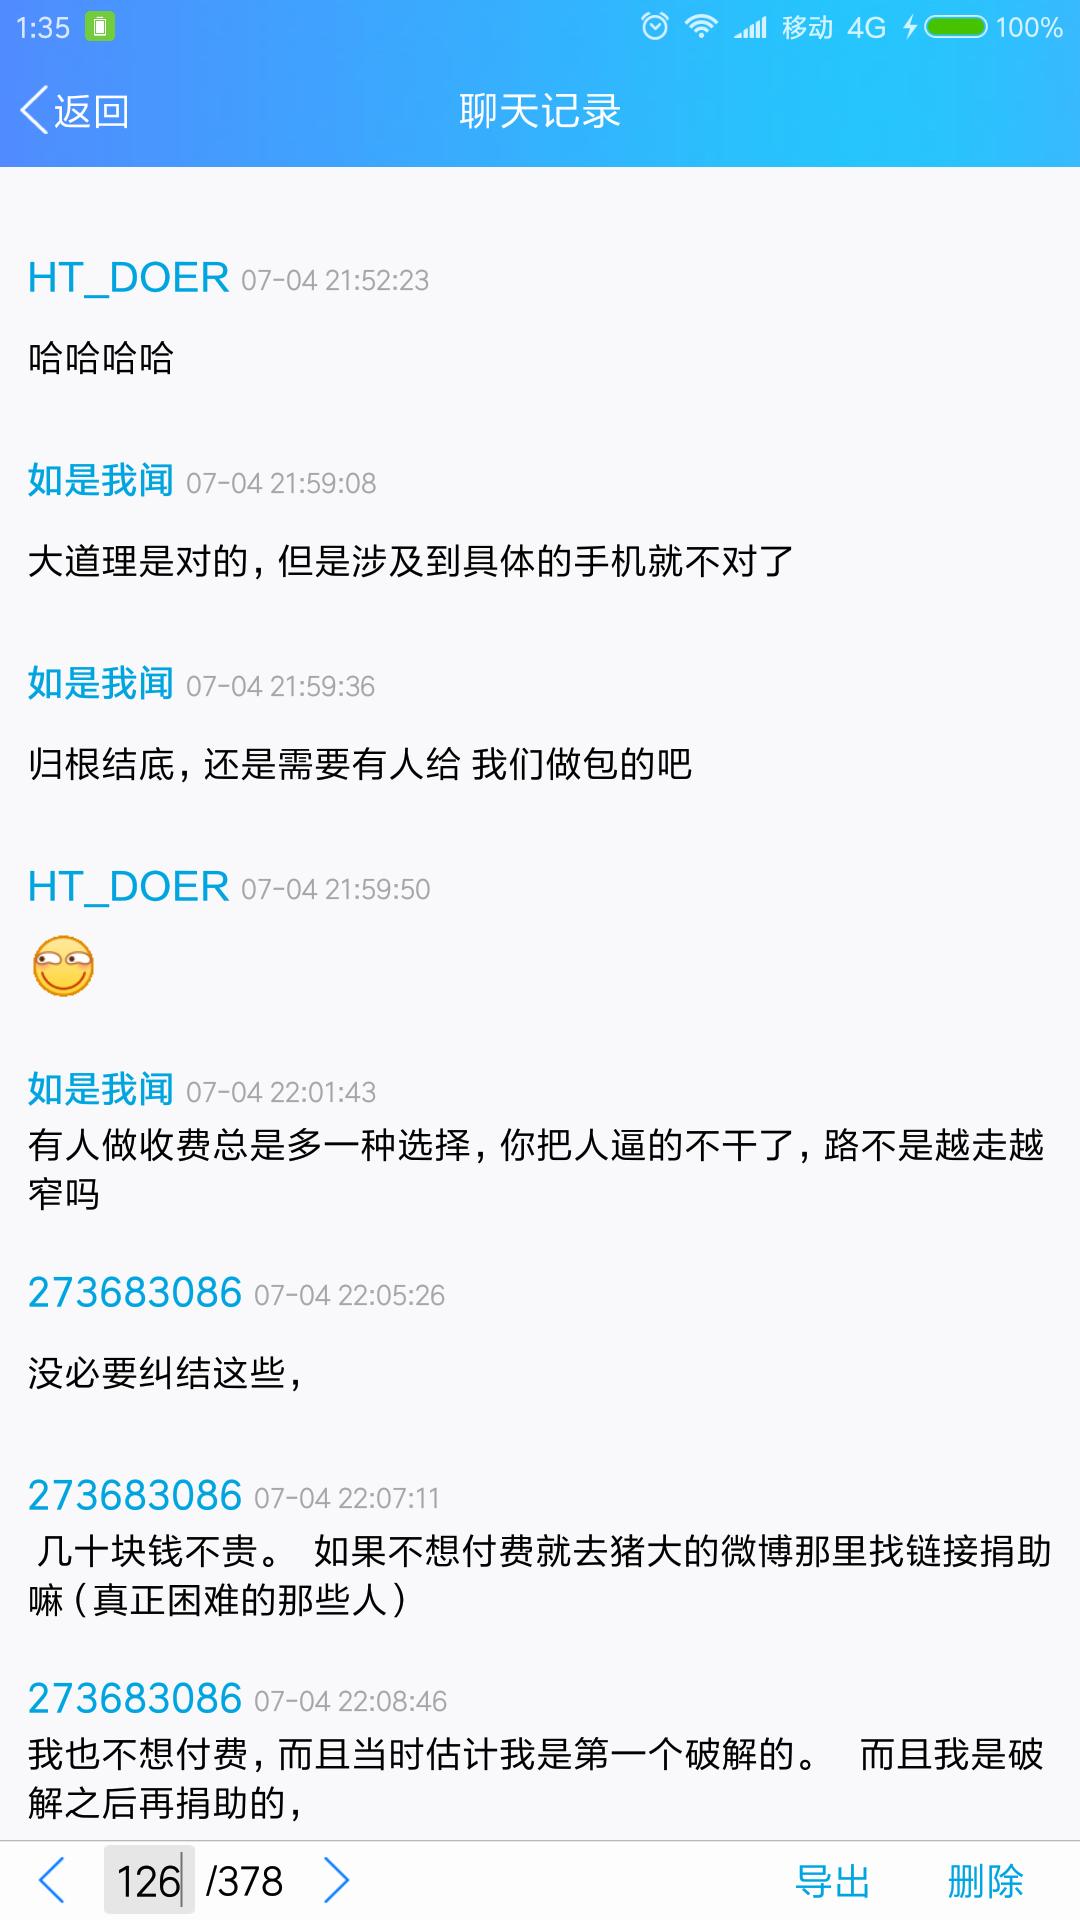 Screenshot_2017-07-09-01-35-44-147_com.tencent.mobileqq.png